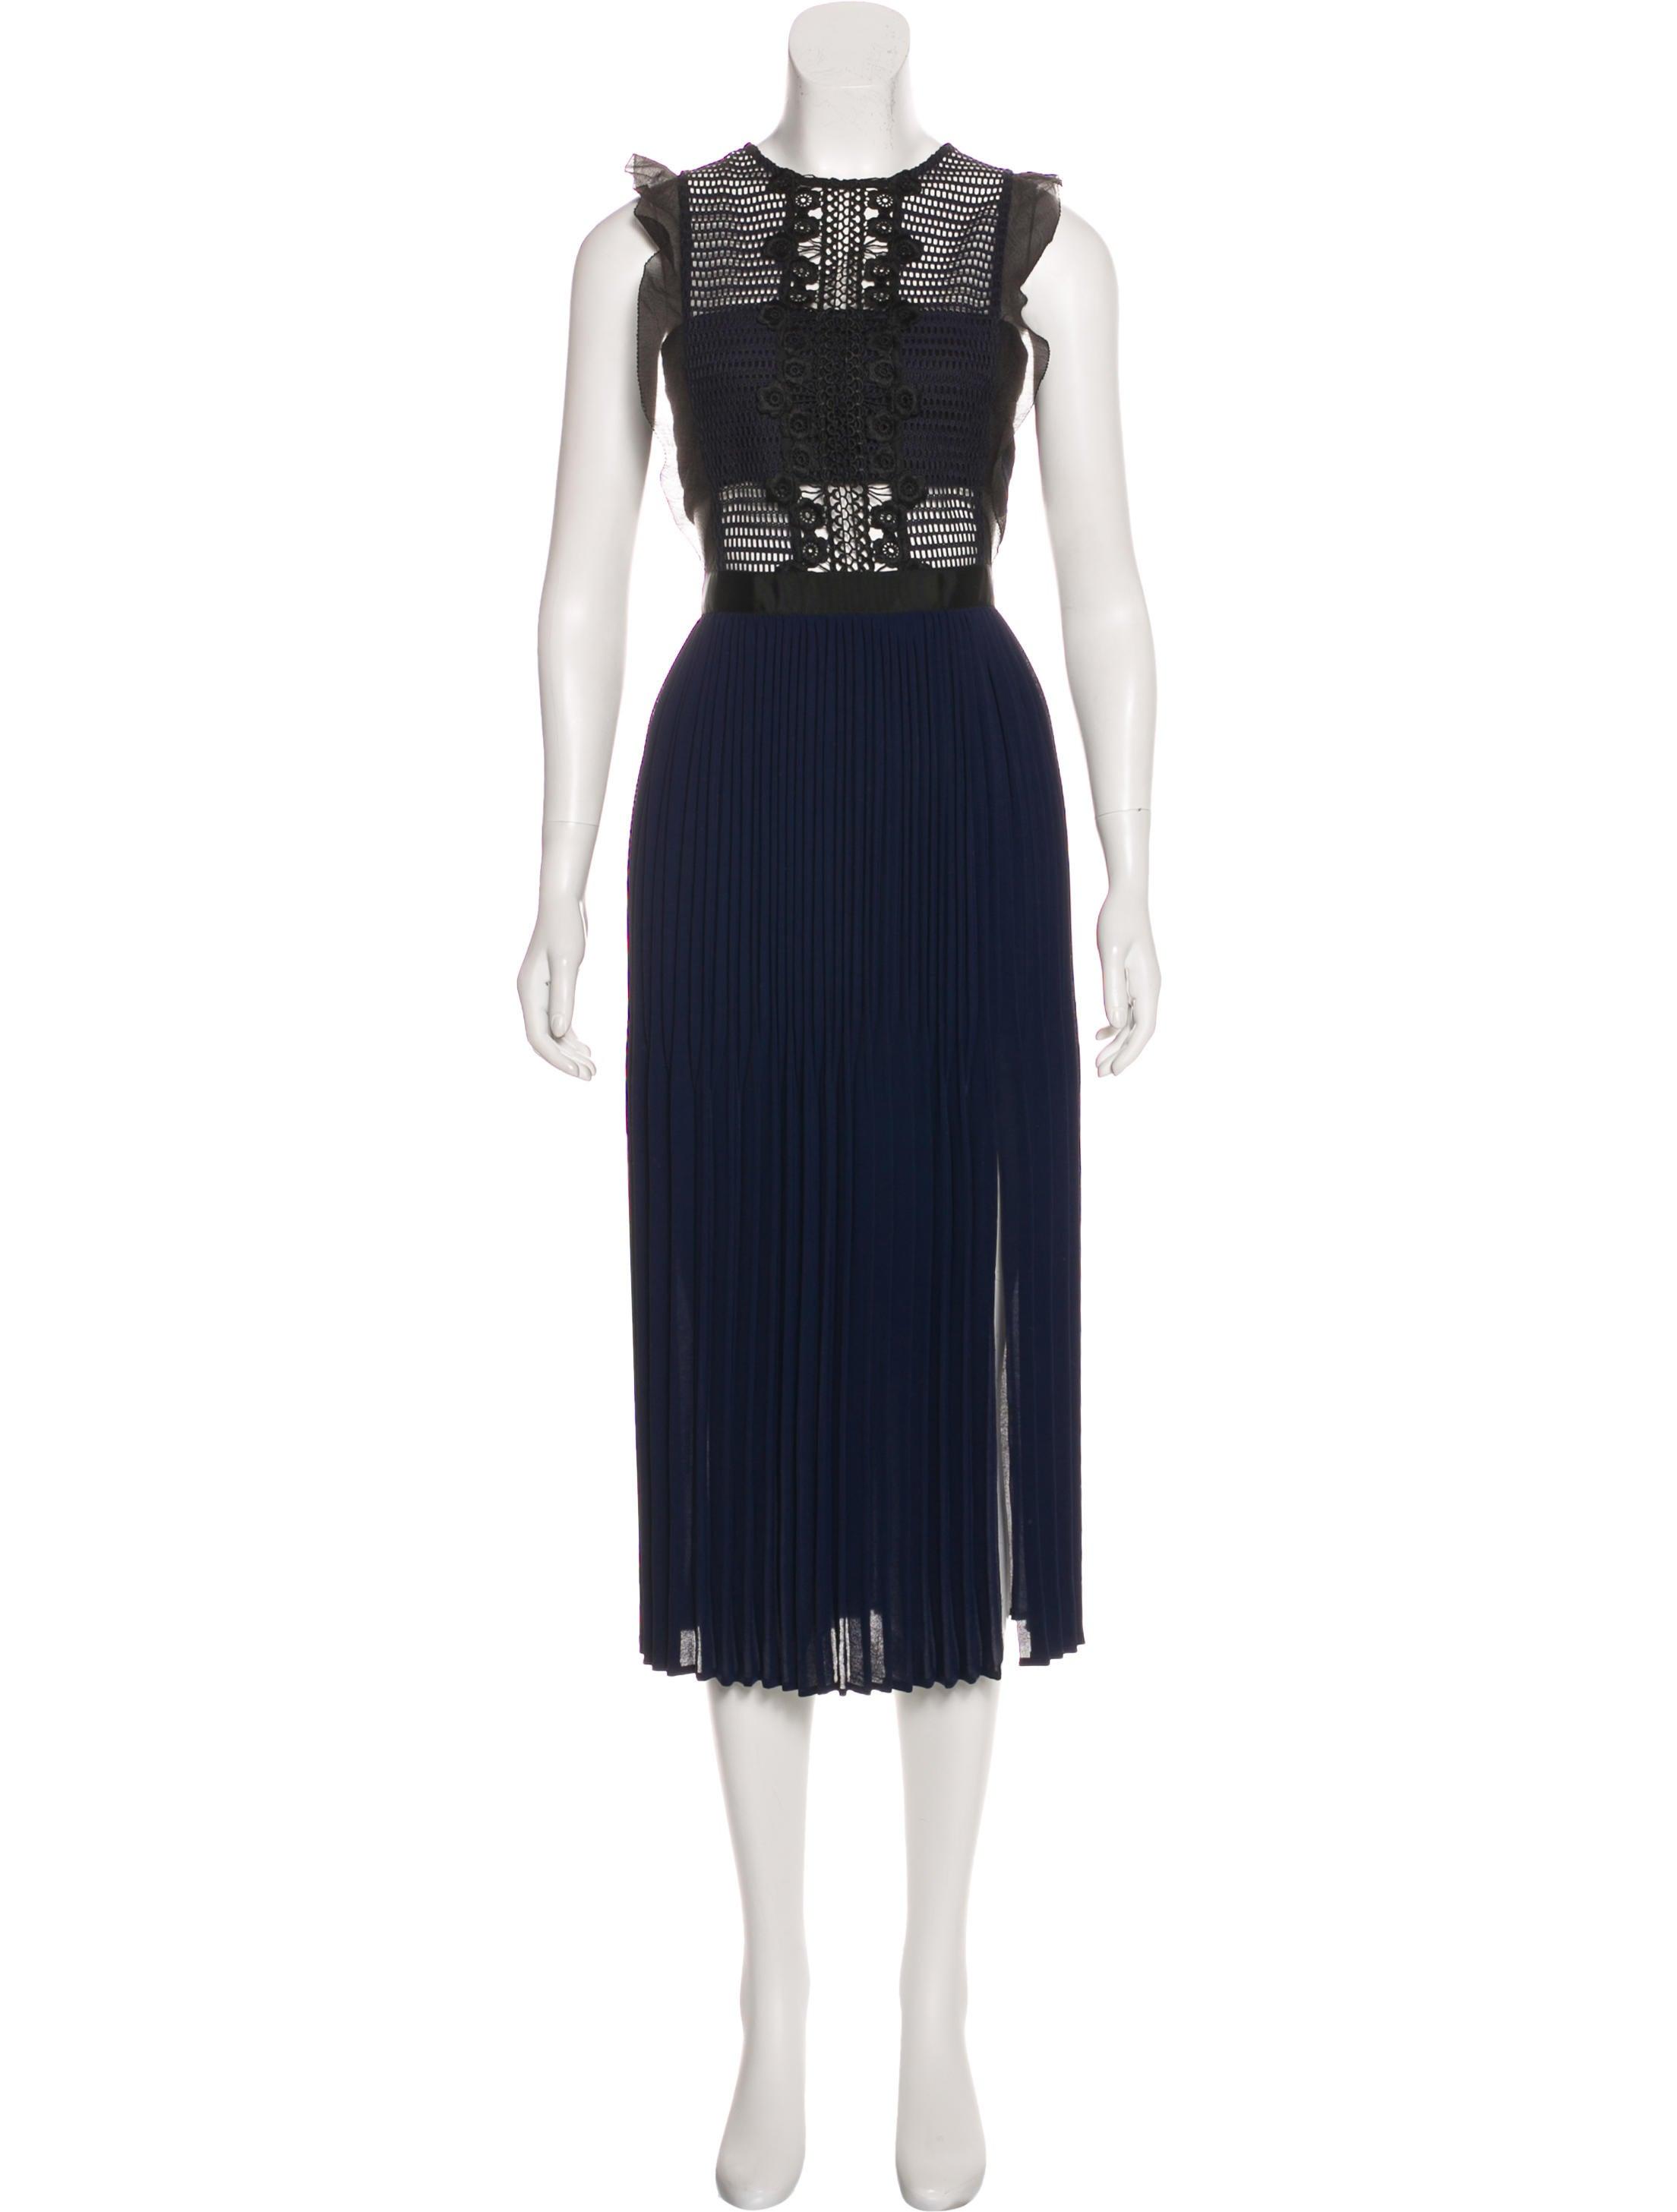 06f5b0c027d Self-Portrait Ruffle-Trimmed Pleated Dress - Clothing - WSELF27402 ...